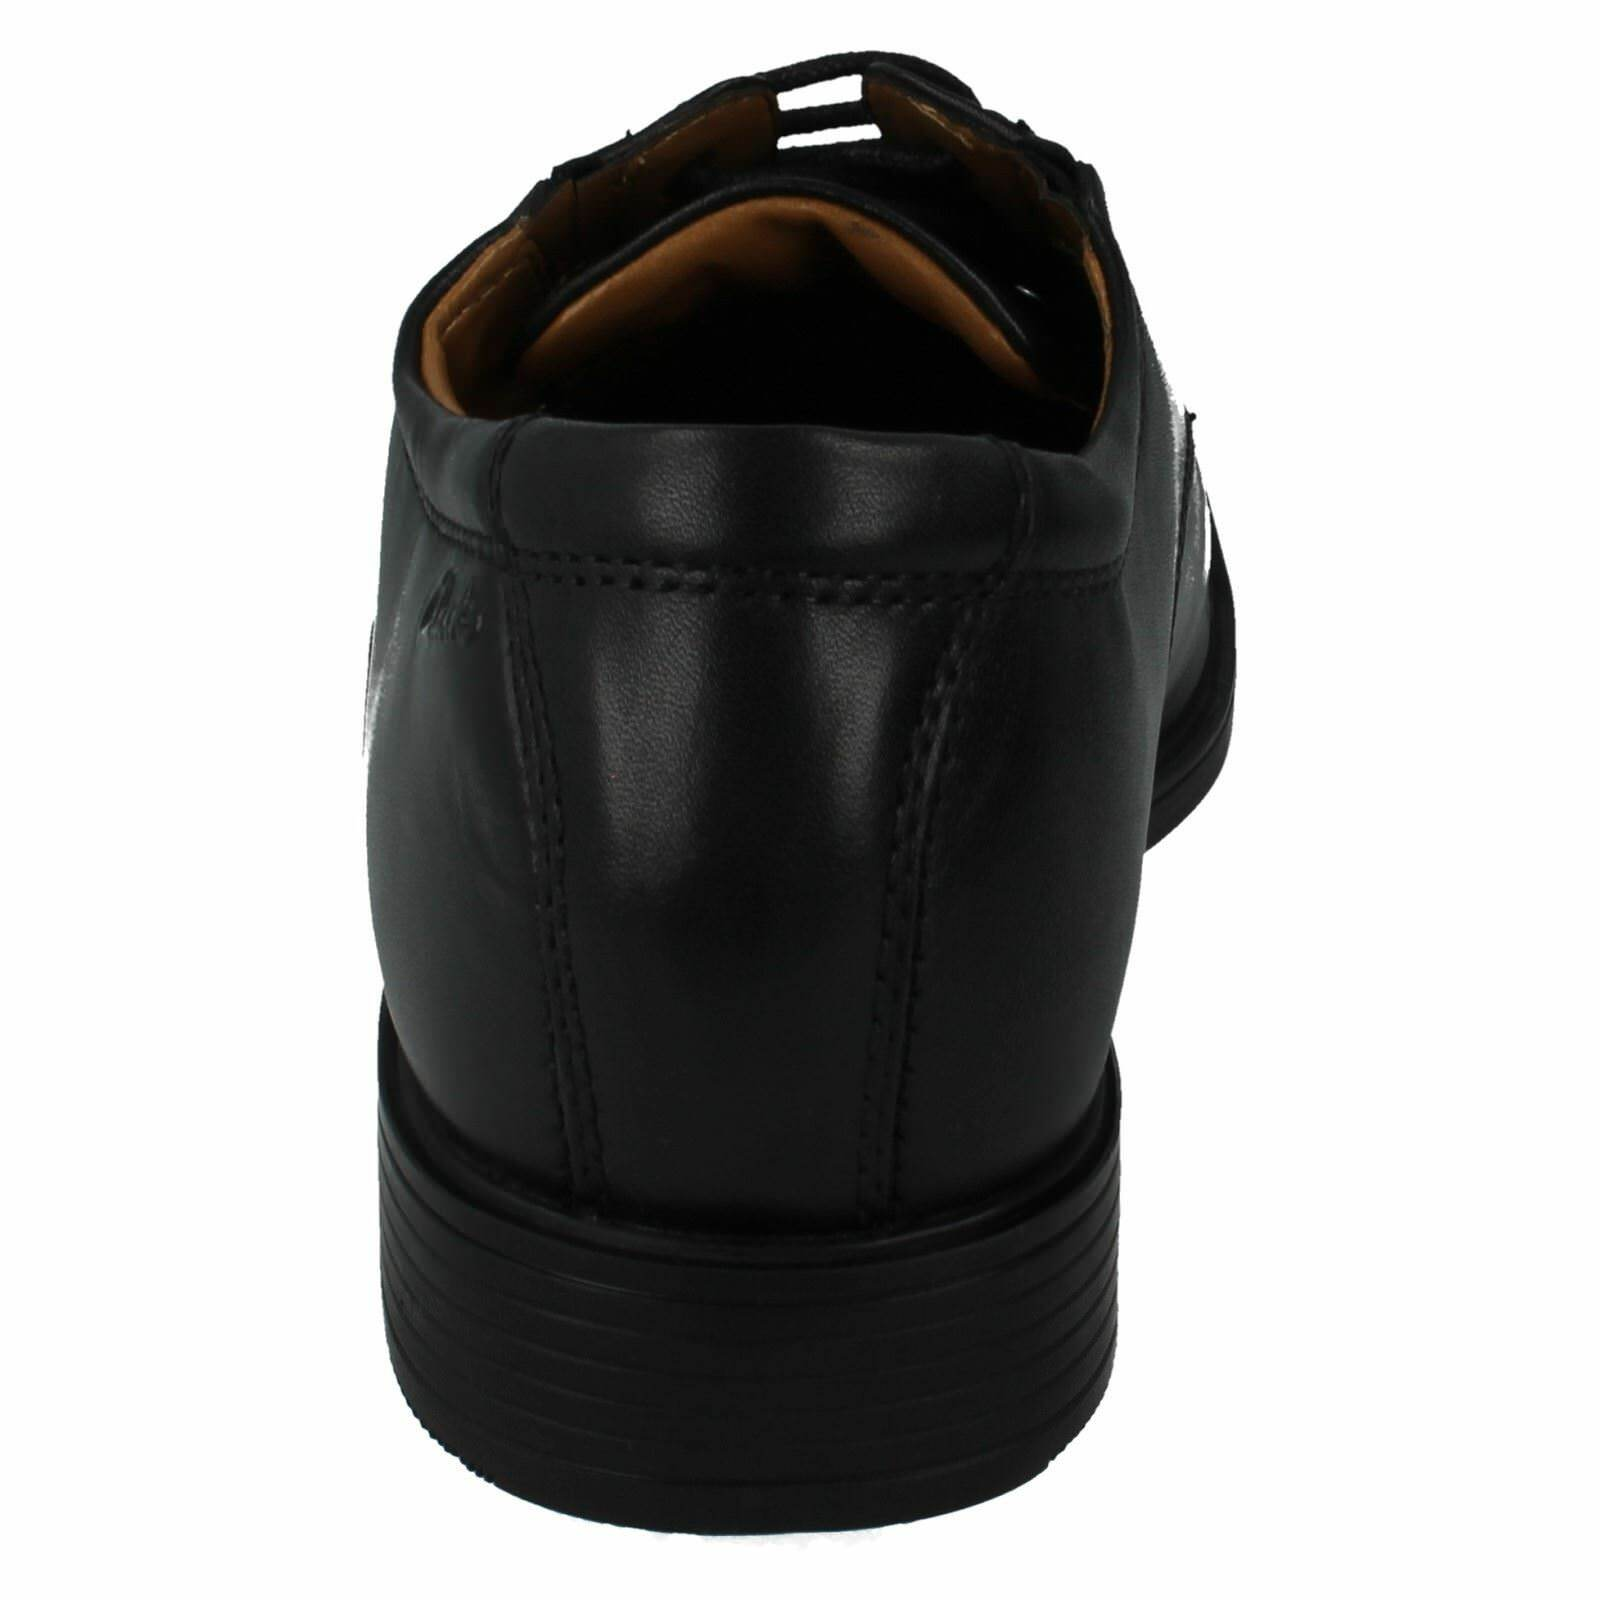 Mens TILDEN CAP Black by leather lace up shoes by Black clarks retail £49.99 b35d51